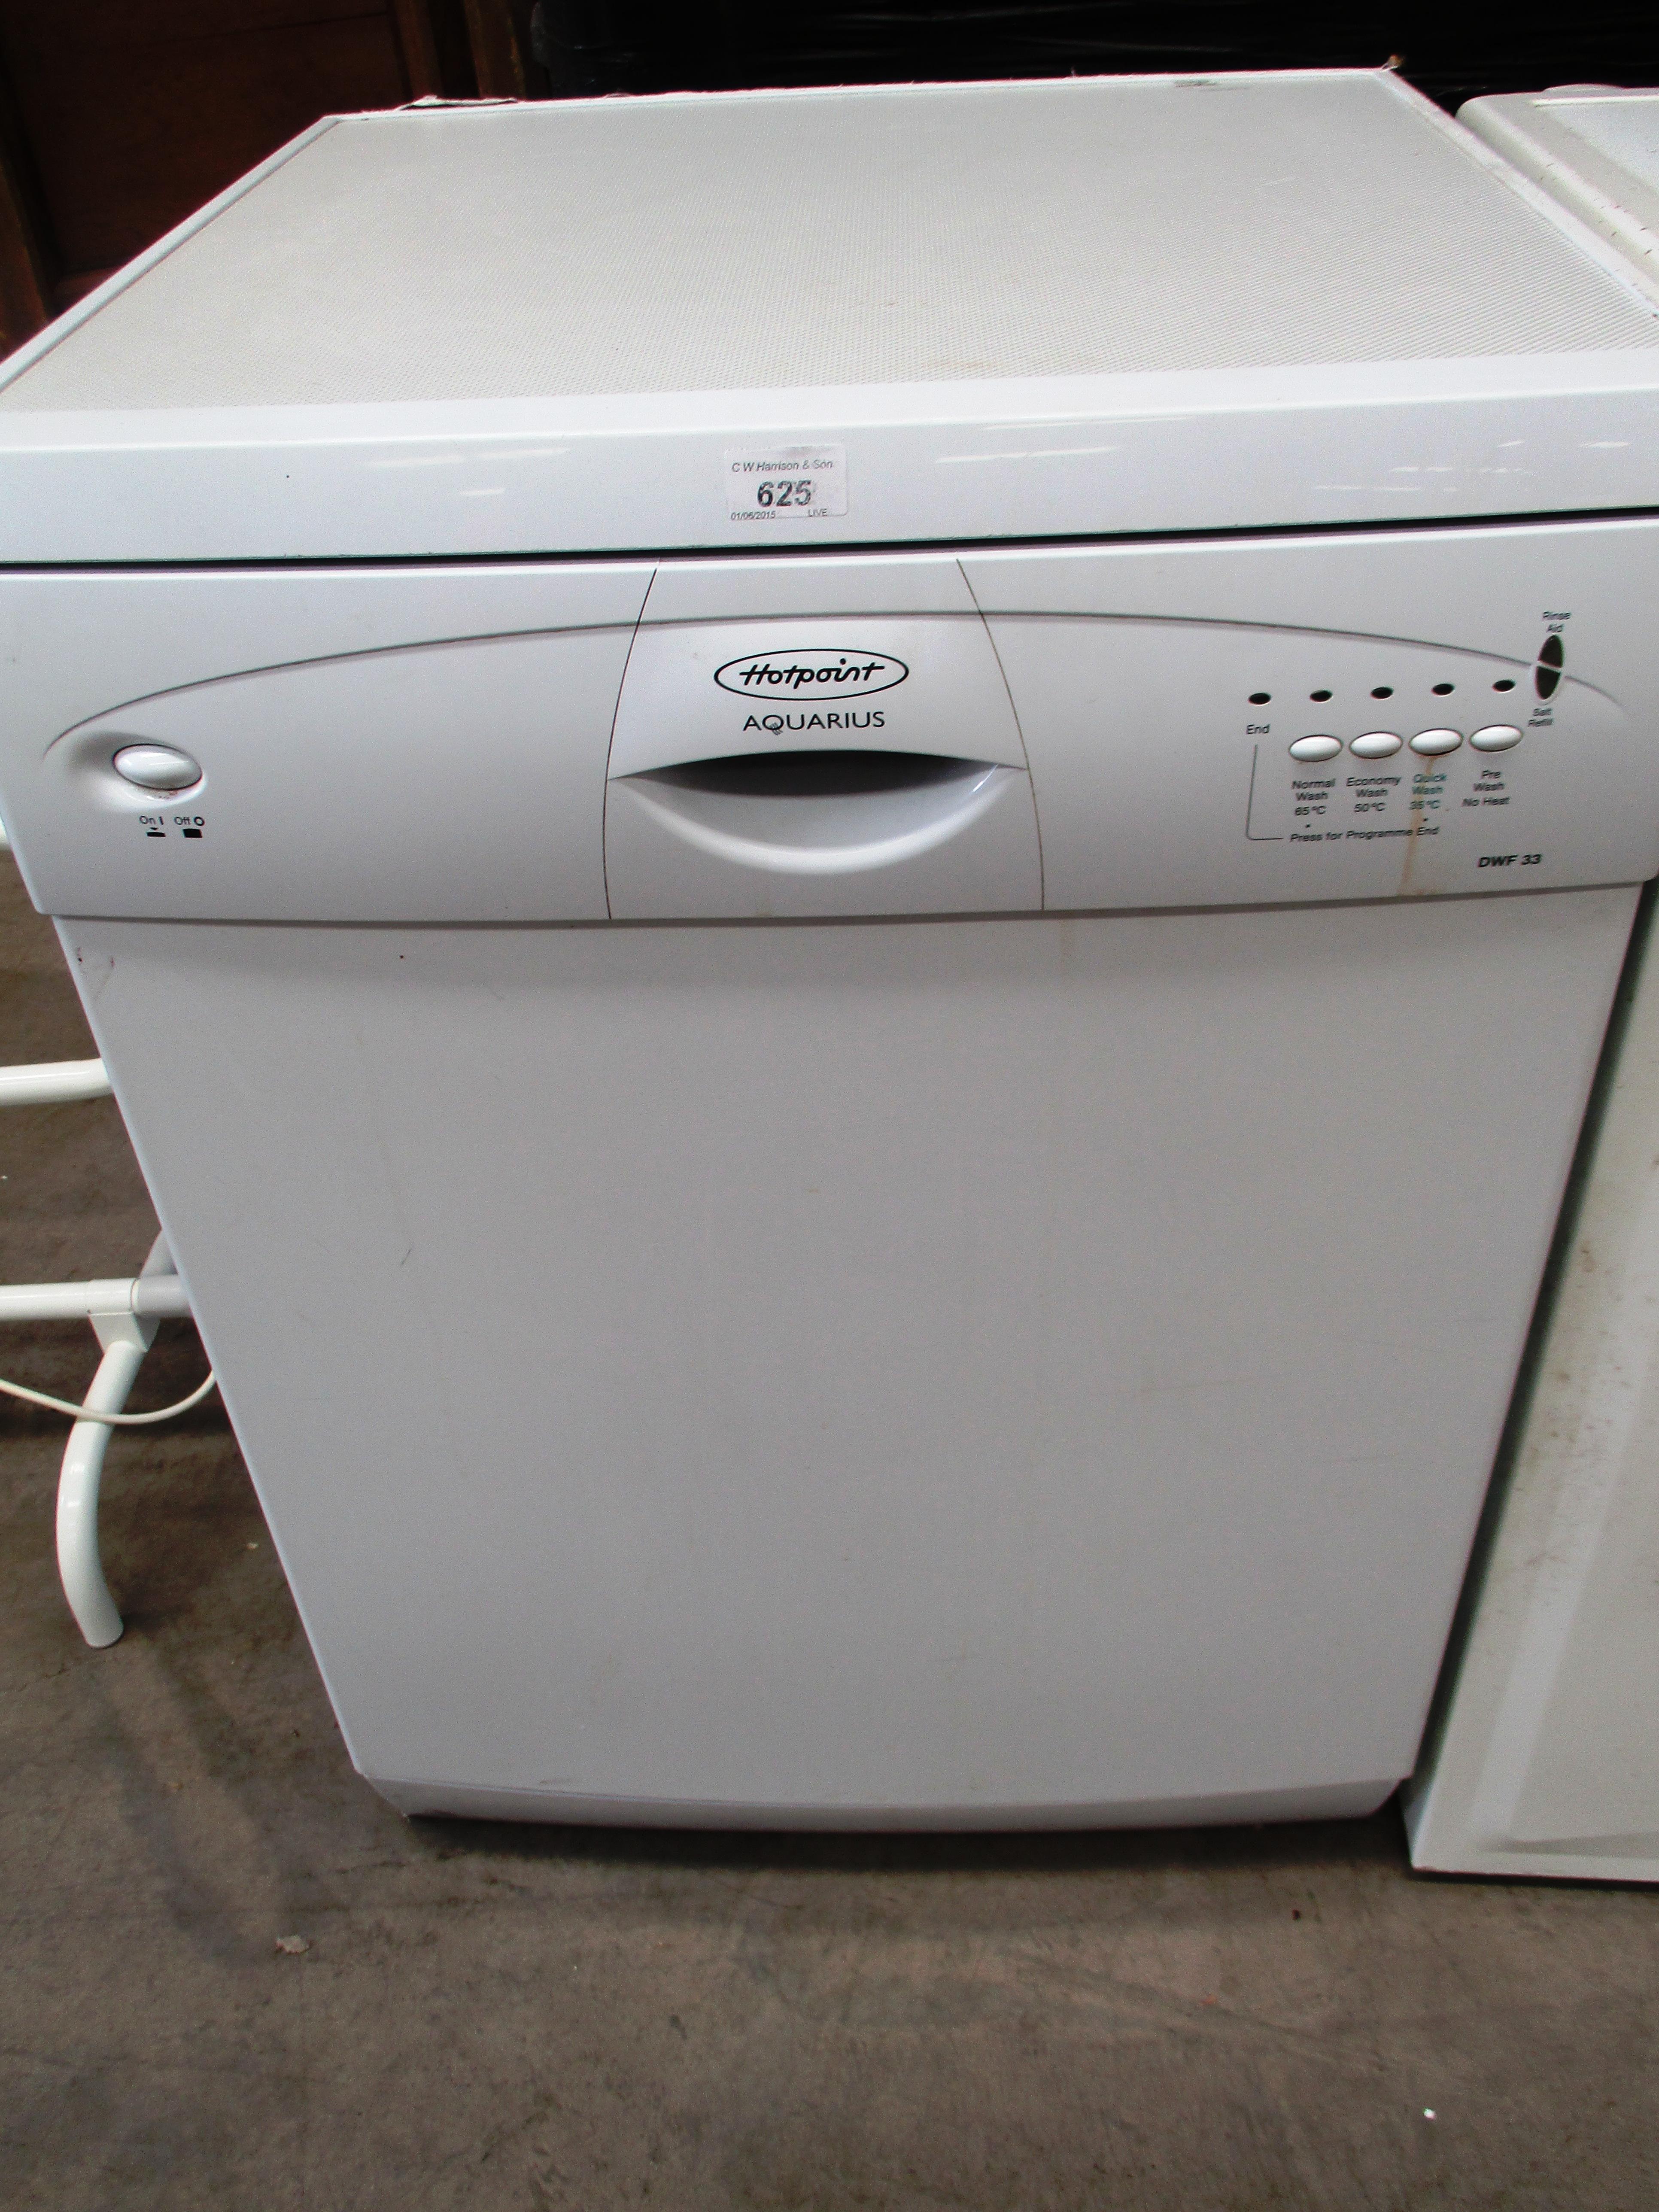 hotpoint aquarius dwf33 dishwasher rh i bidder com Hotpoint Dryer Manuals Hotpoint User Manuals